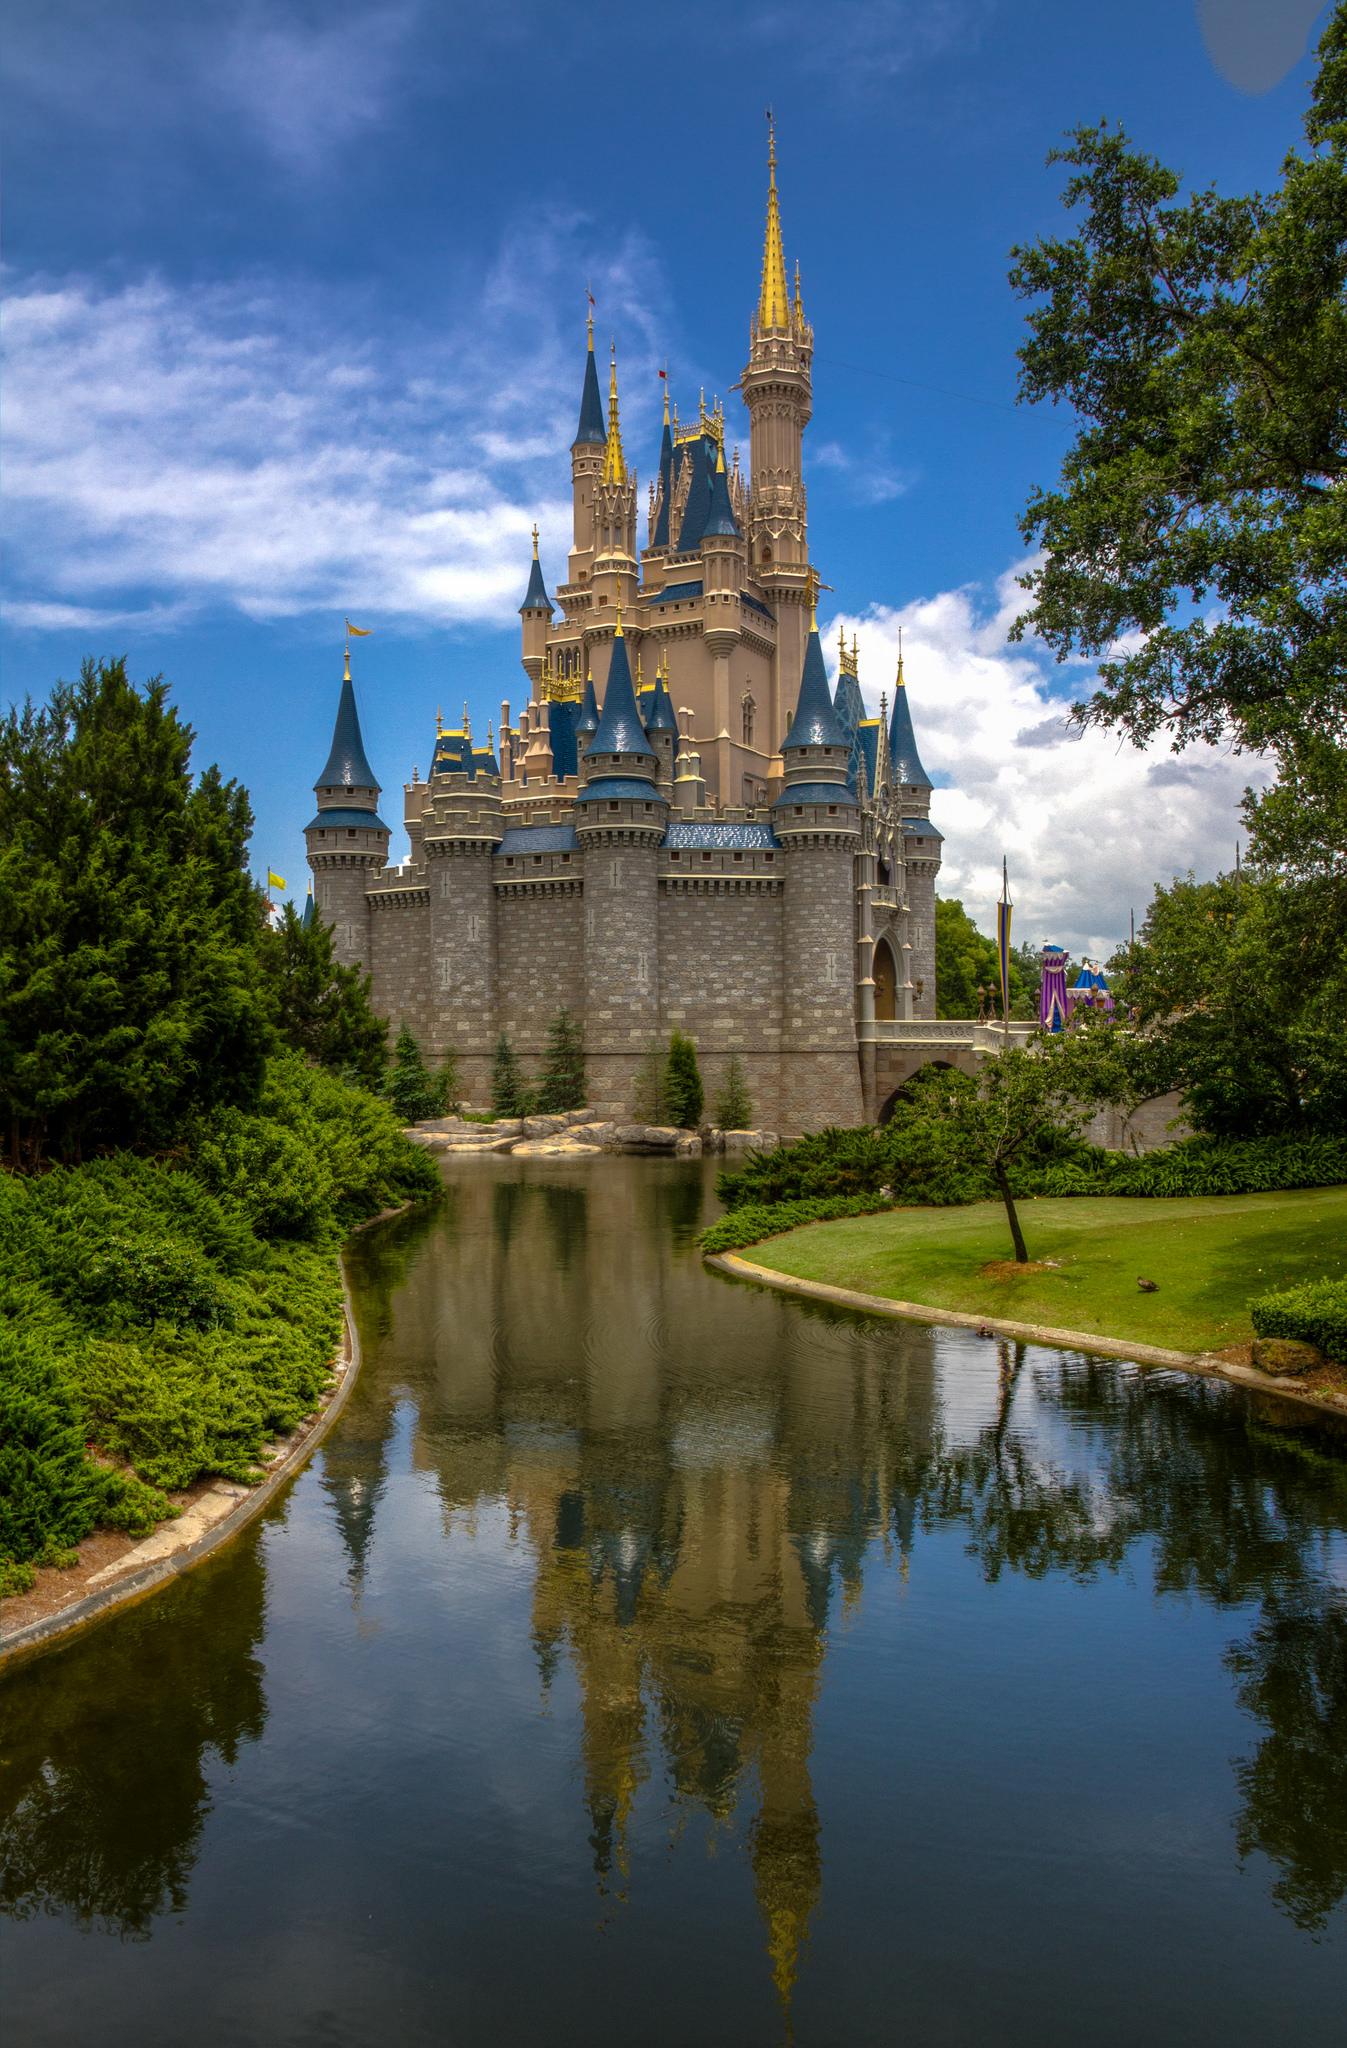 Disney World Castle